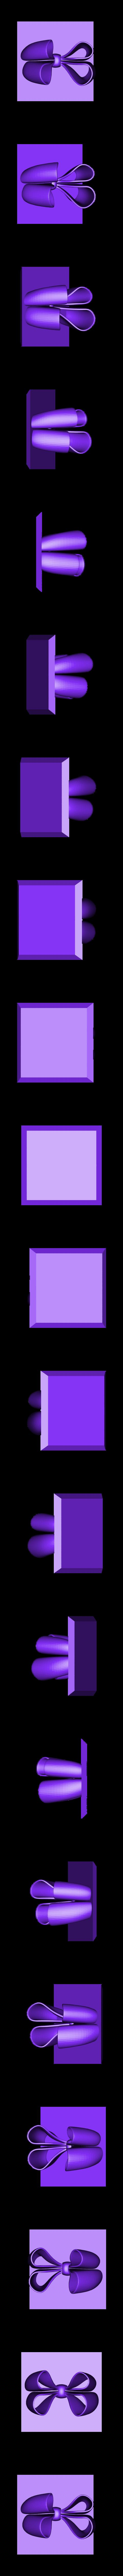 GiftBox_medium_top_bow2.STL Download free STL file Gift Box - Medium • 3D printer model, DDDeco